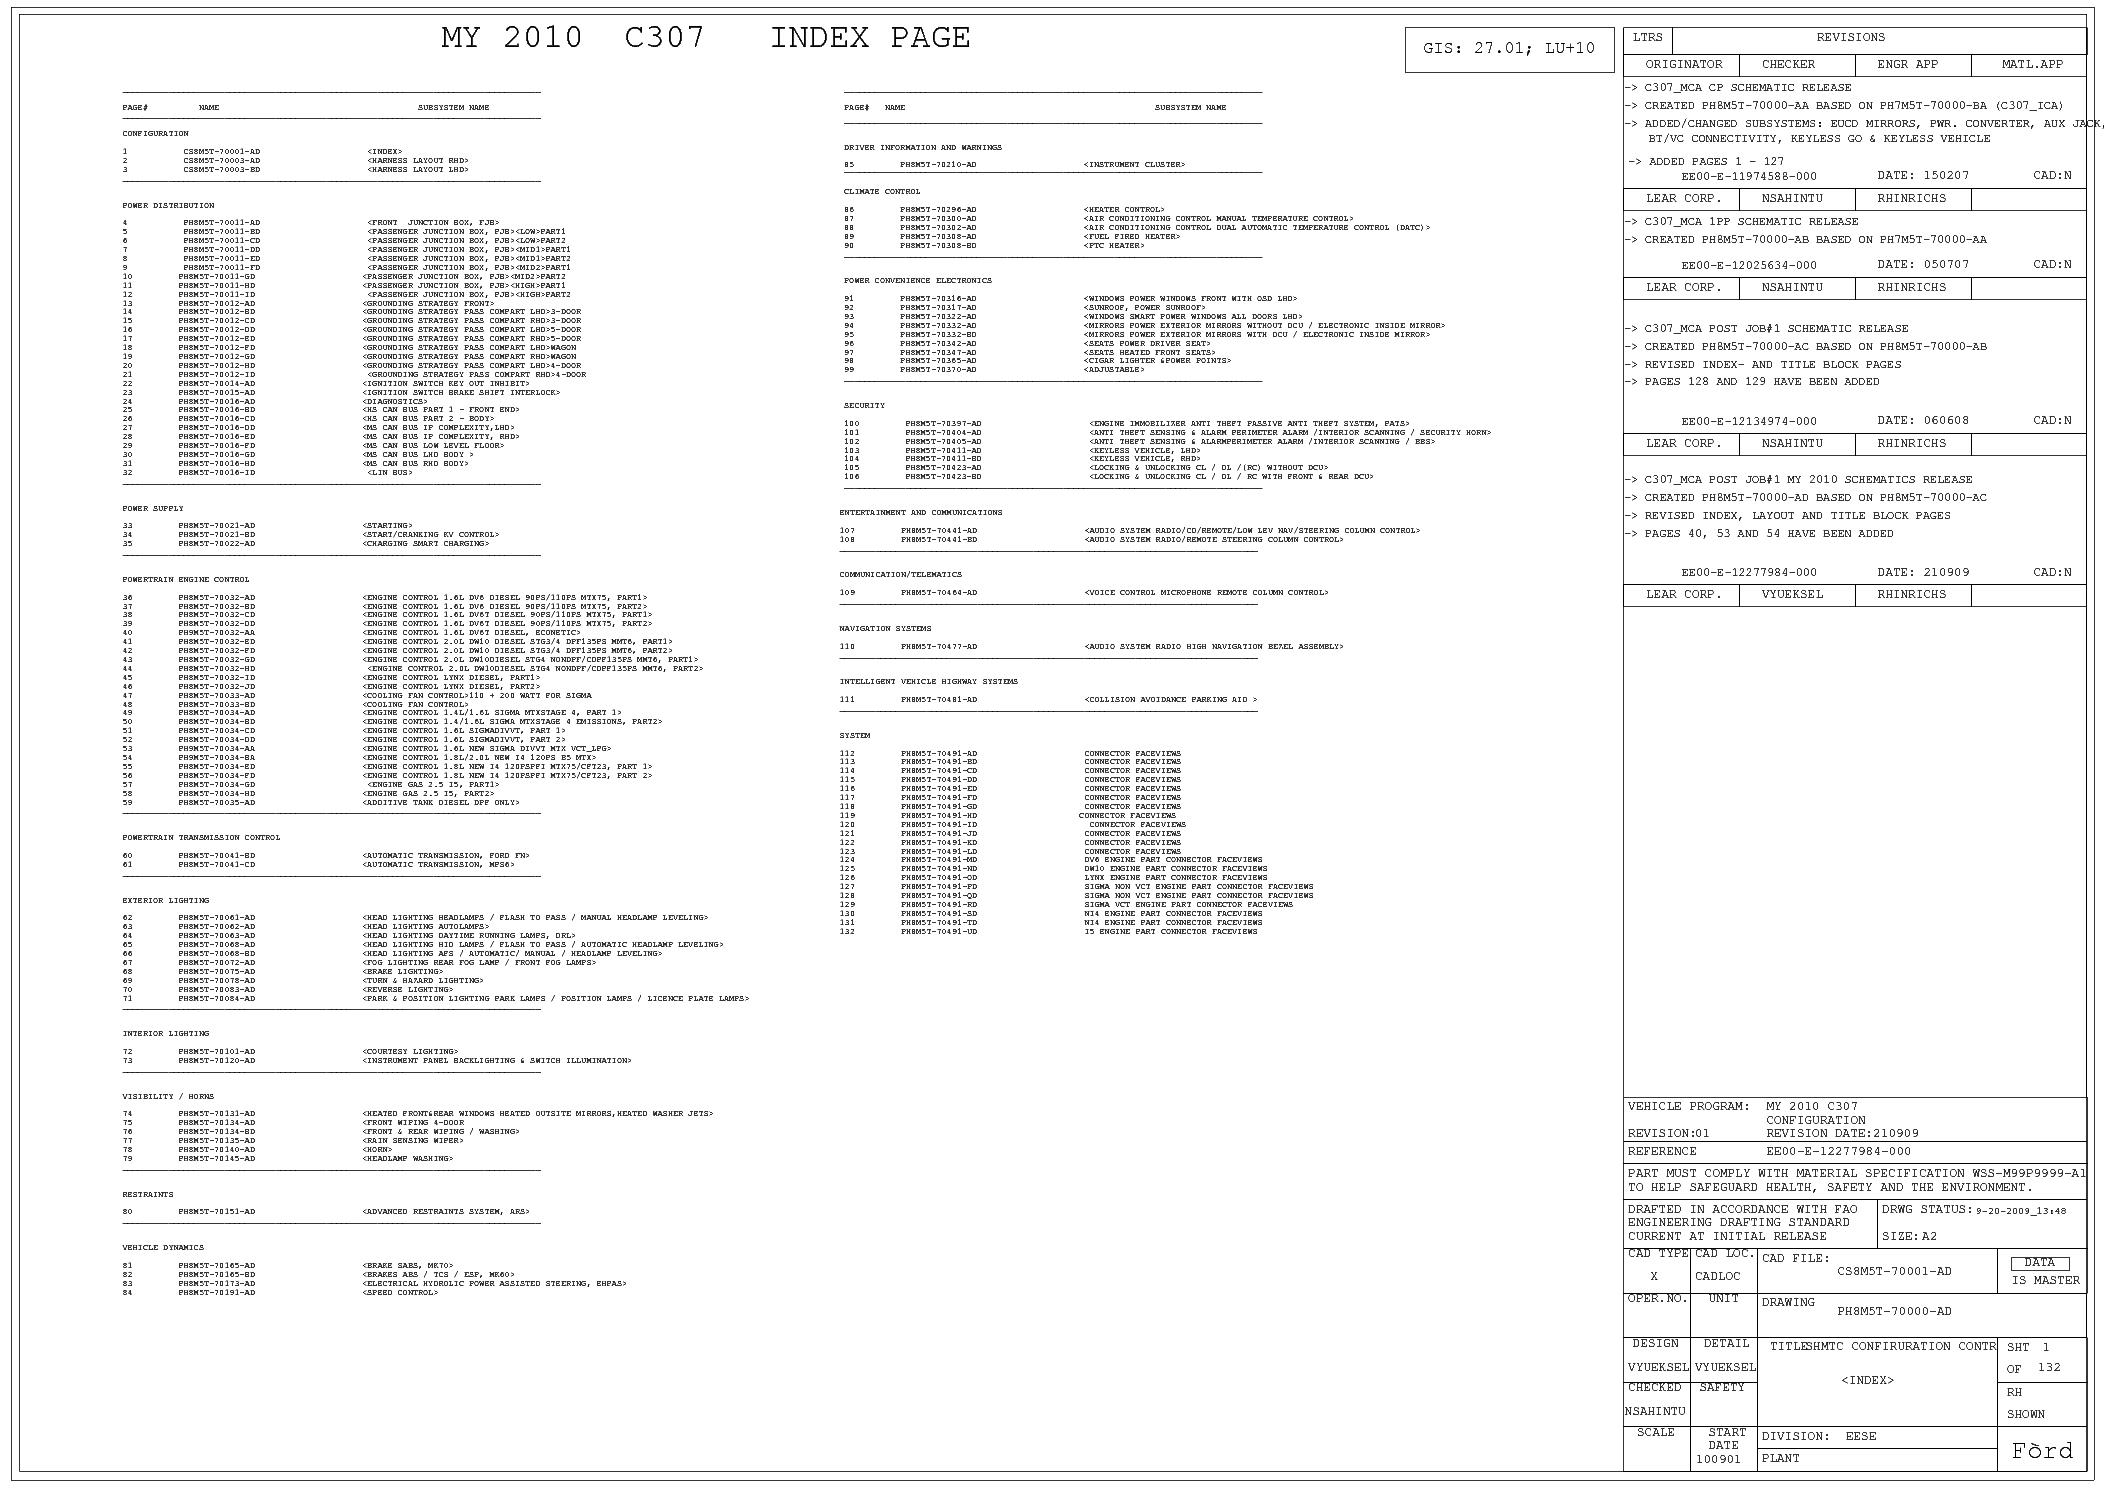 Ford Focus 2005 Wiring Diagram ford Focus Mk2 2 5 Ph8m5t Full Wiring Diagram Service Manual